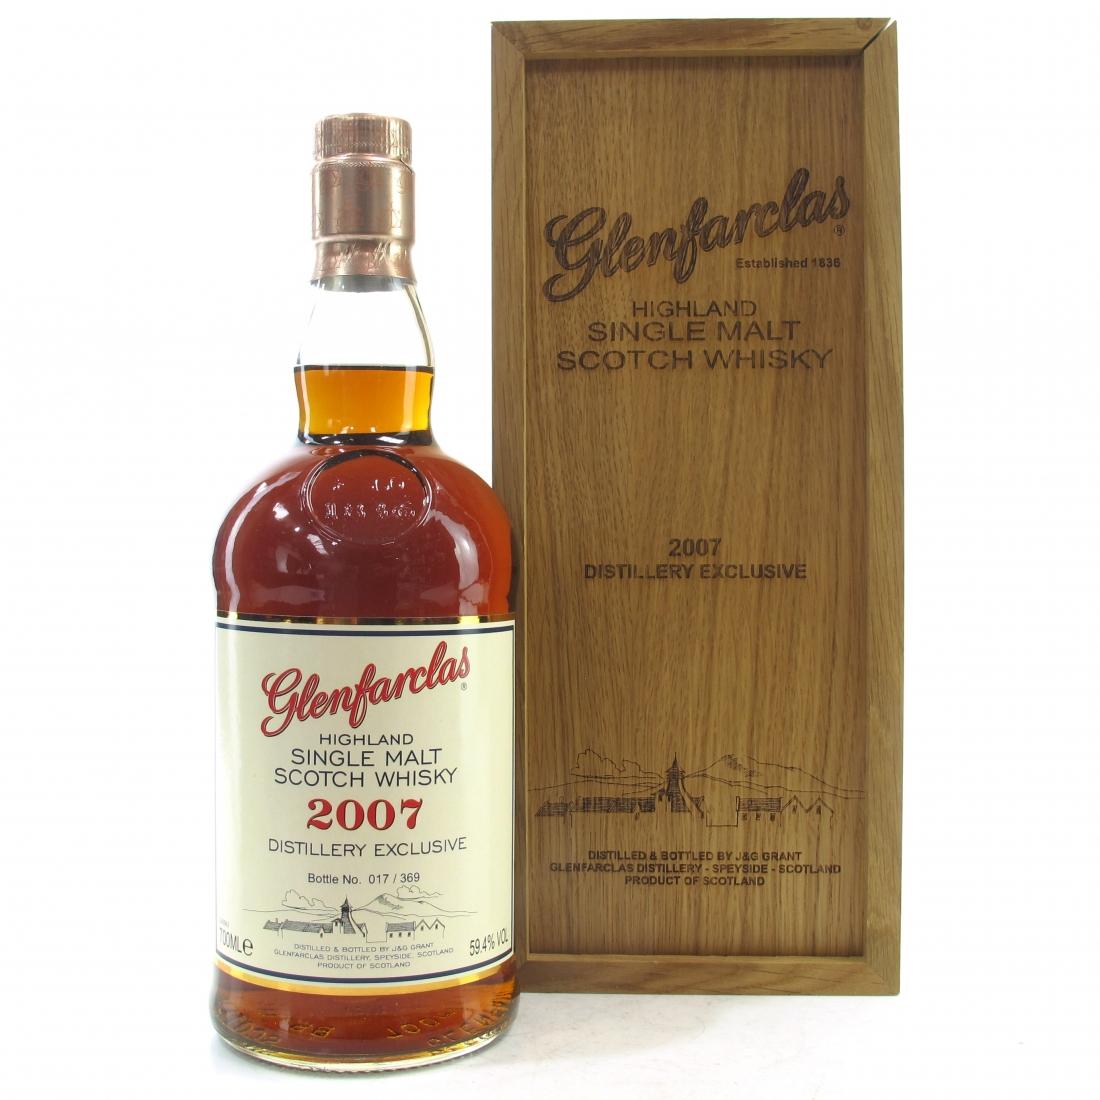 Glenfarclas 2007 Distillery Exclusive / Spirit of Speyside 2017